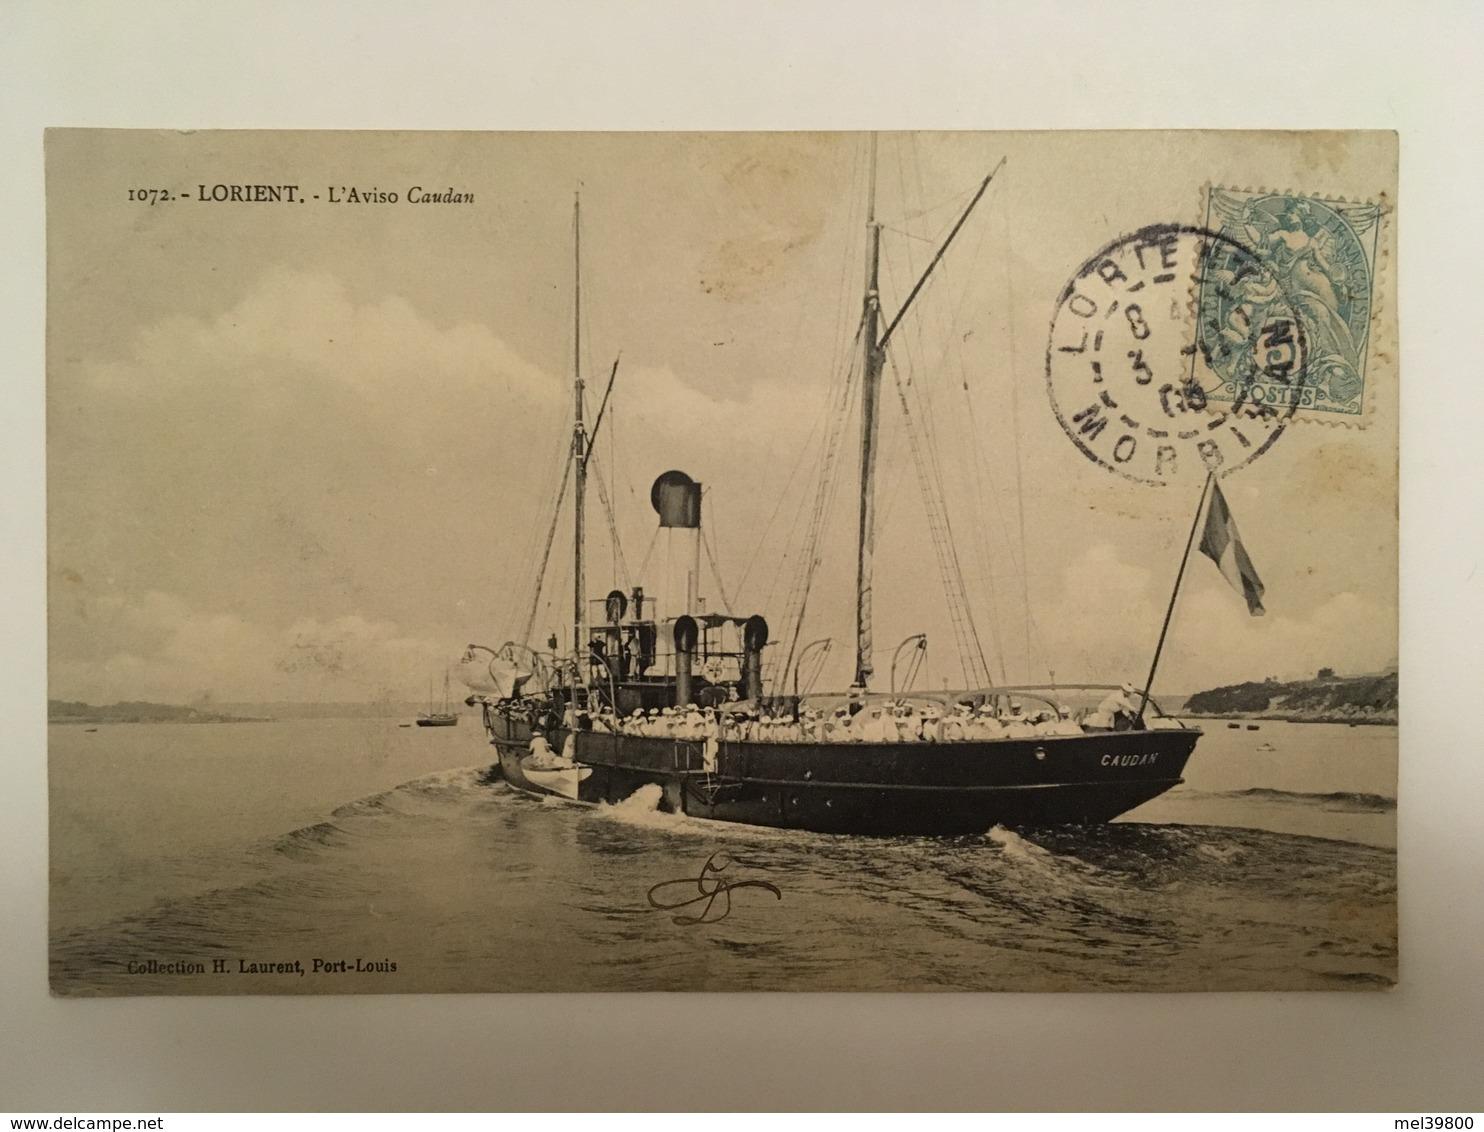 Lorient - L'Aviso Caudan - Boten